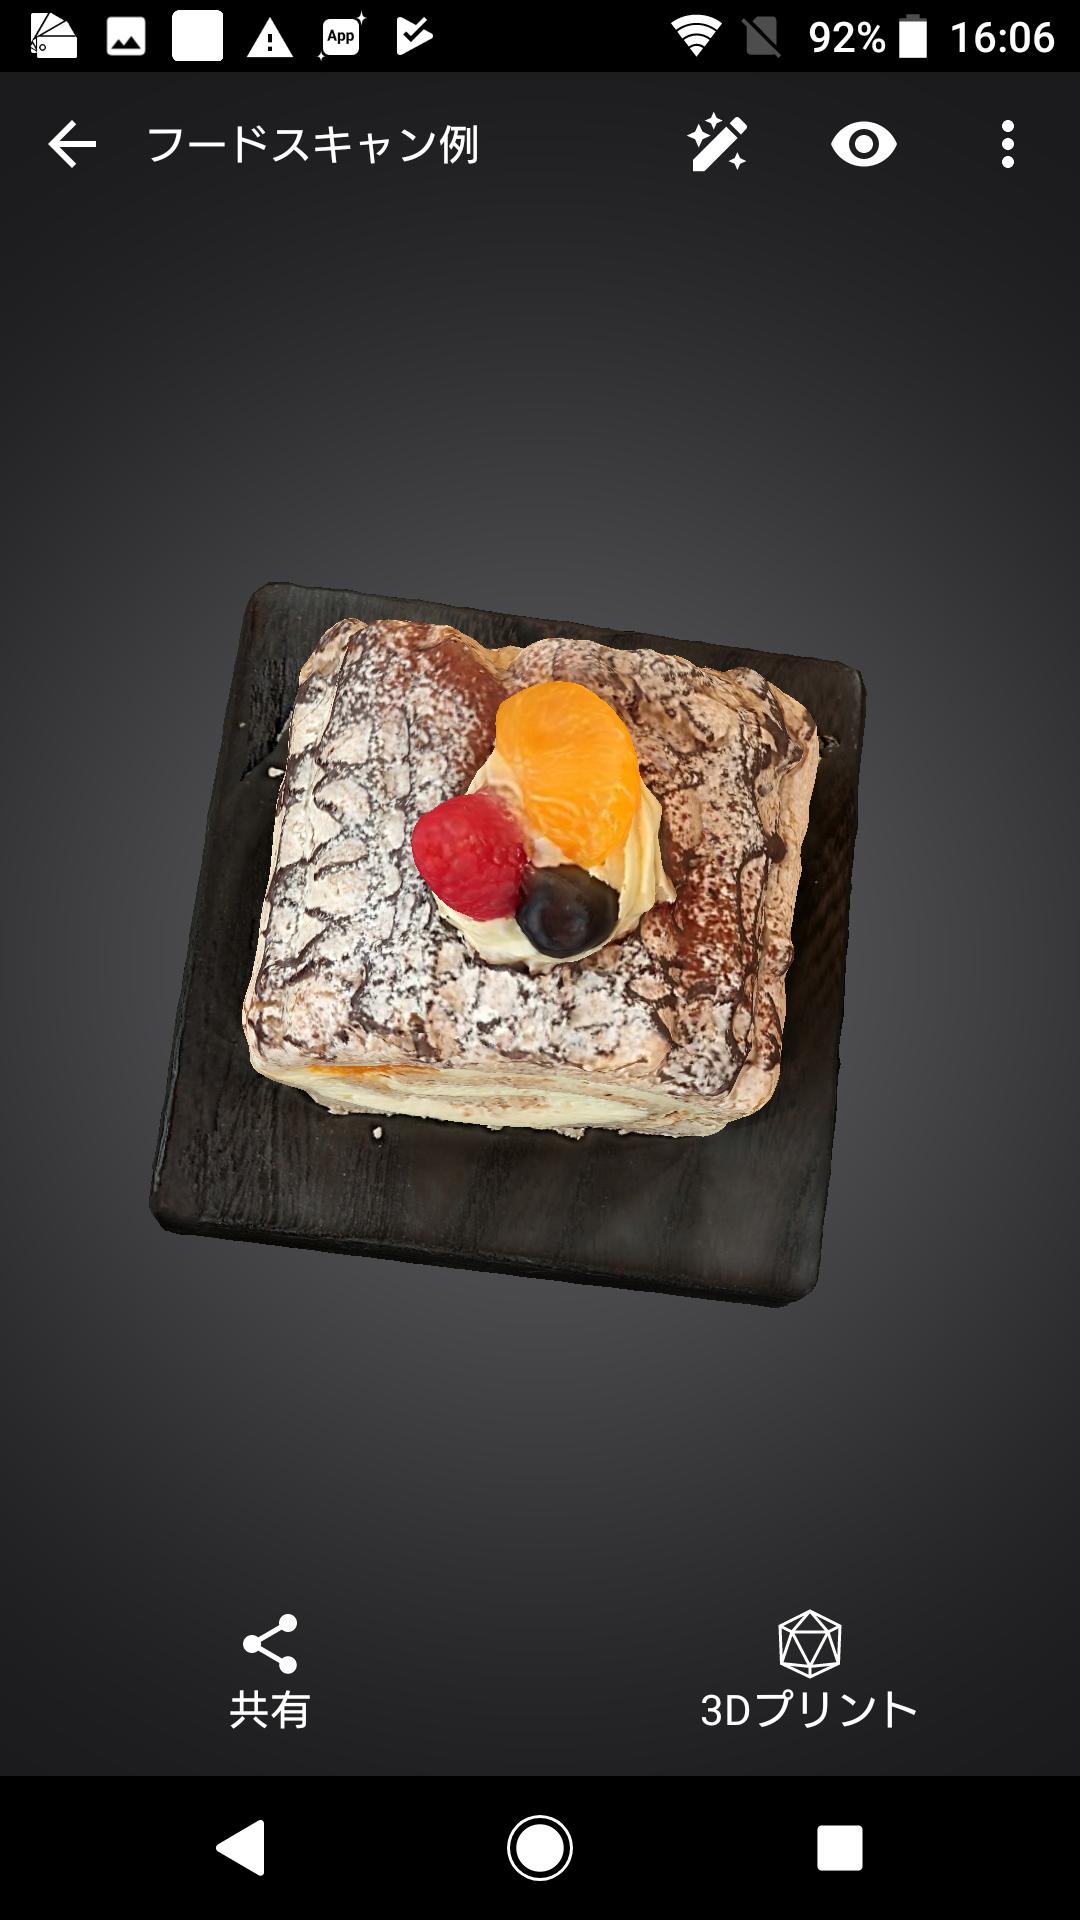 Sony Xperia XZ1 3Dクリエーター 3Dプリント 自由造形スキャン ケーキ2